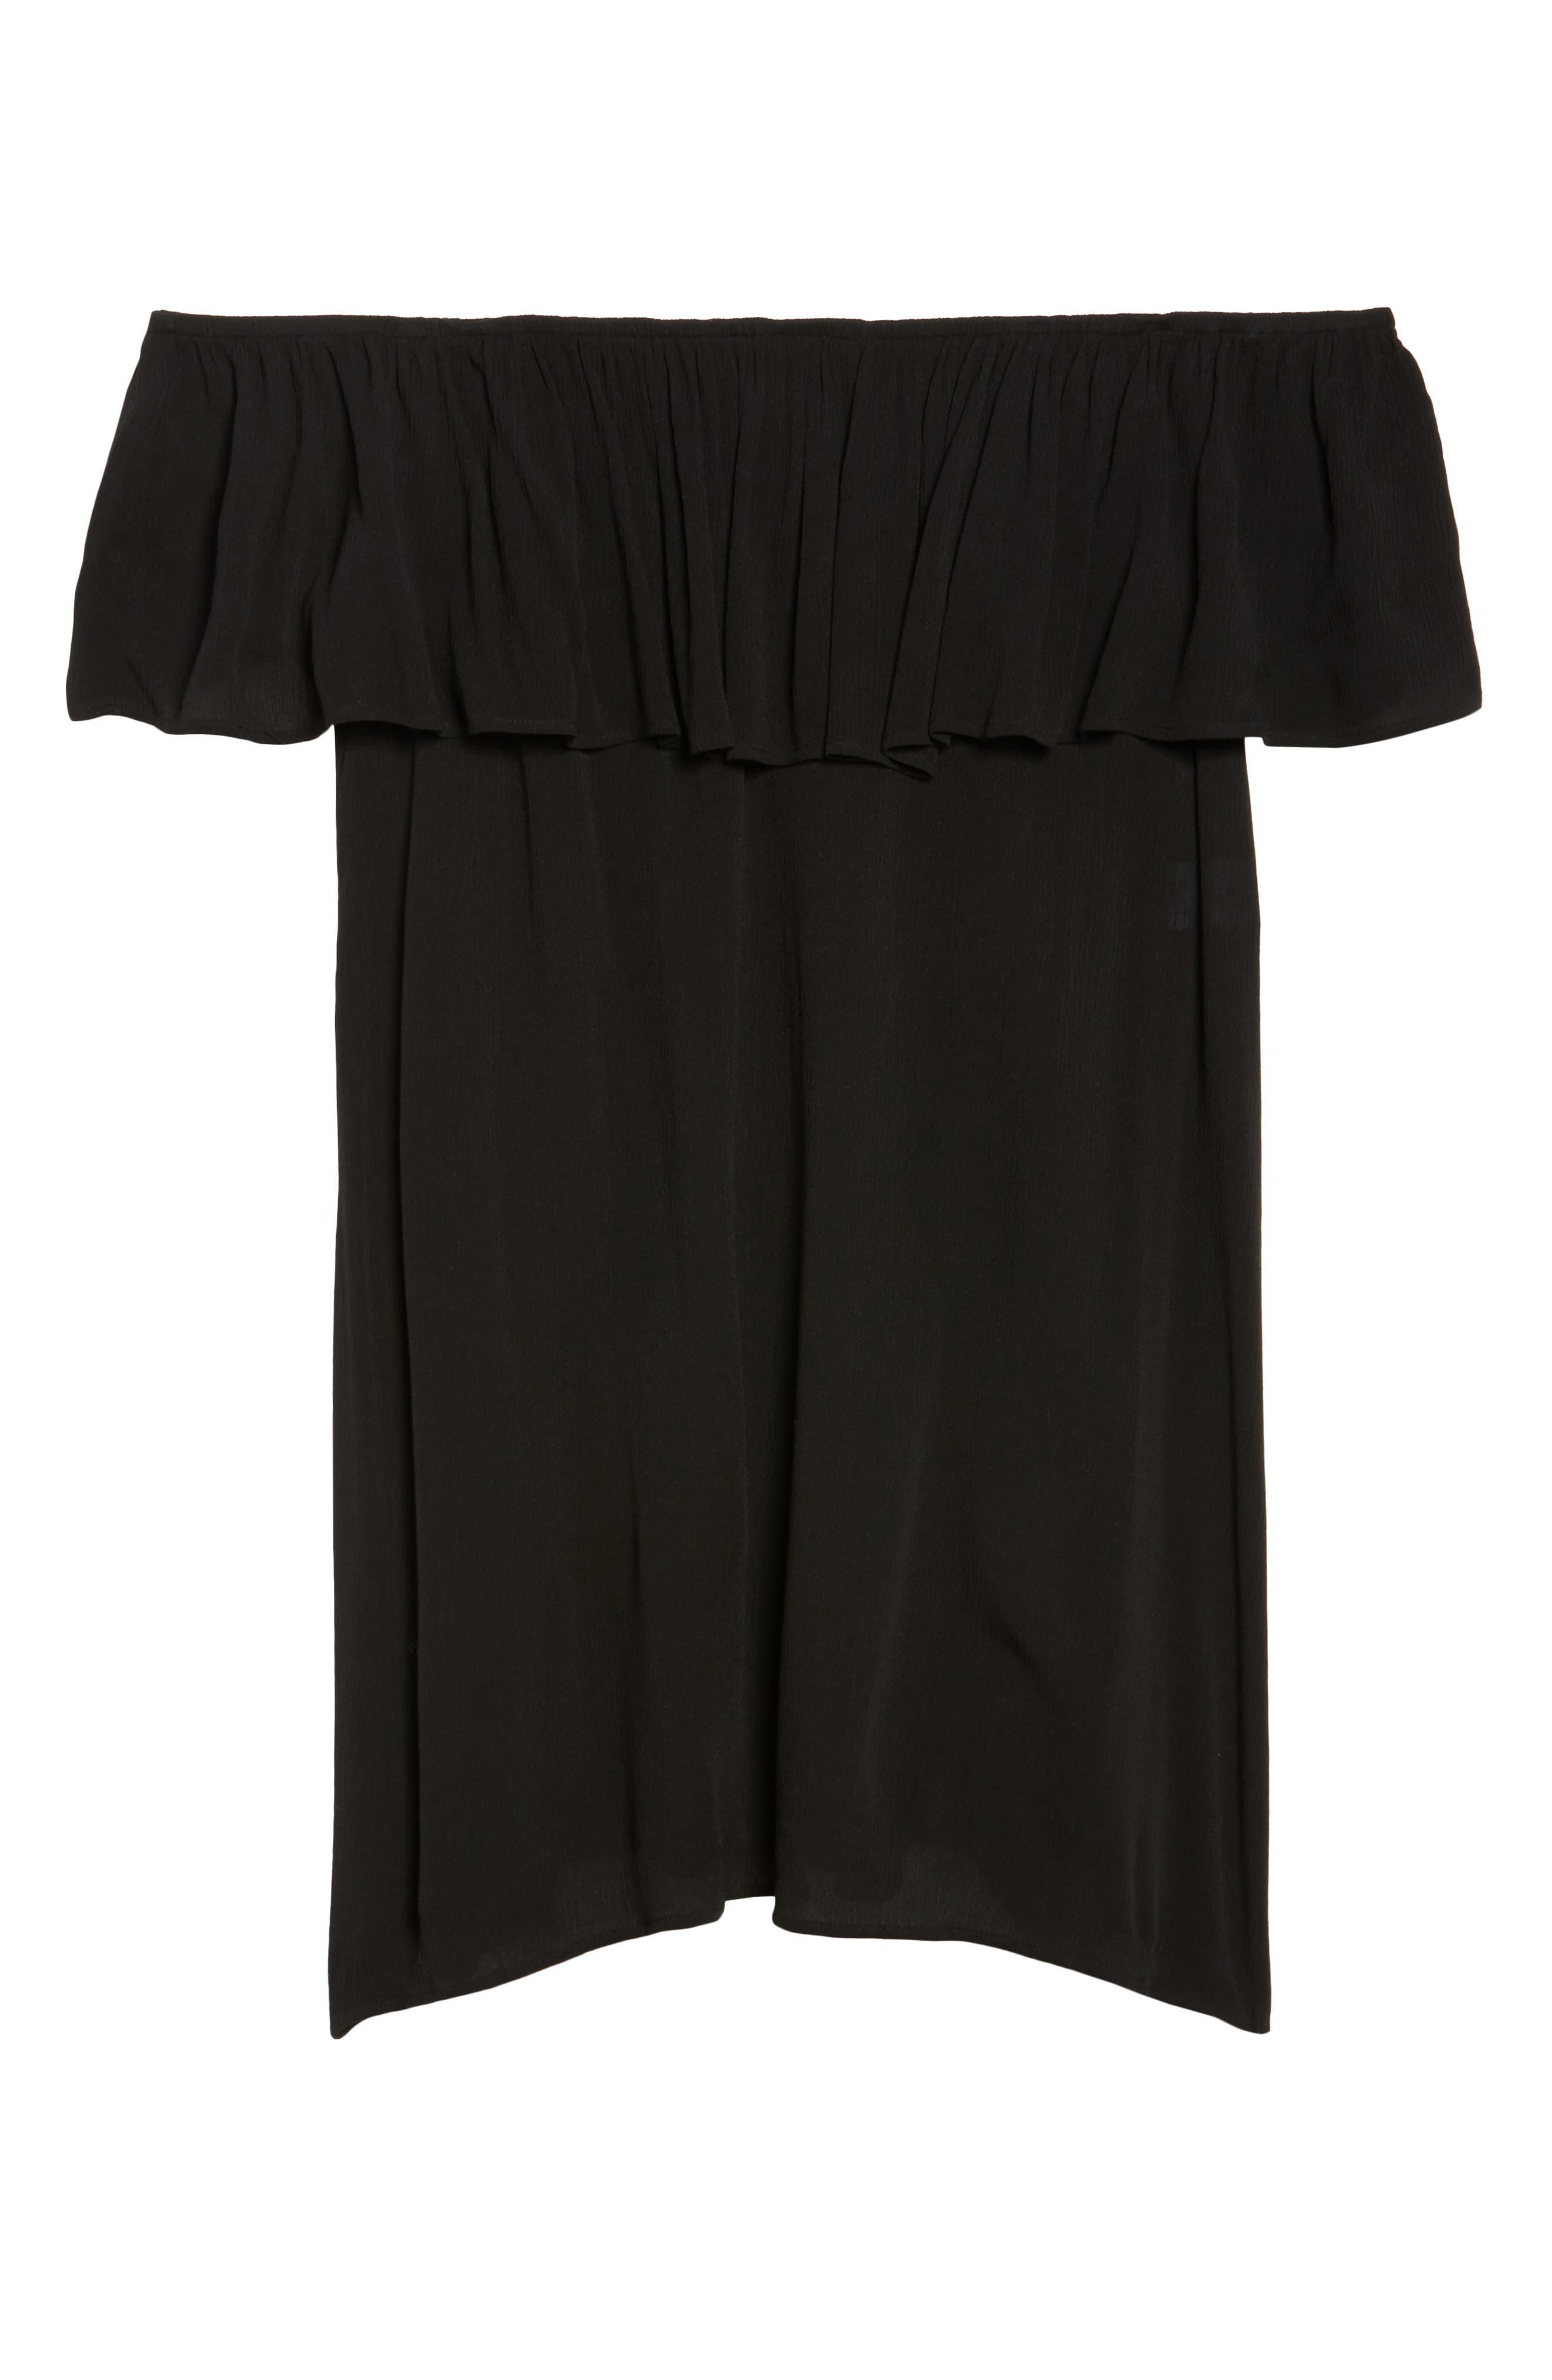 Southern Belle Off the Shoulder Cover-Up Dress,                             Alternate thumbnail 6, color,                             001